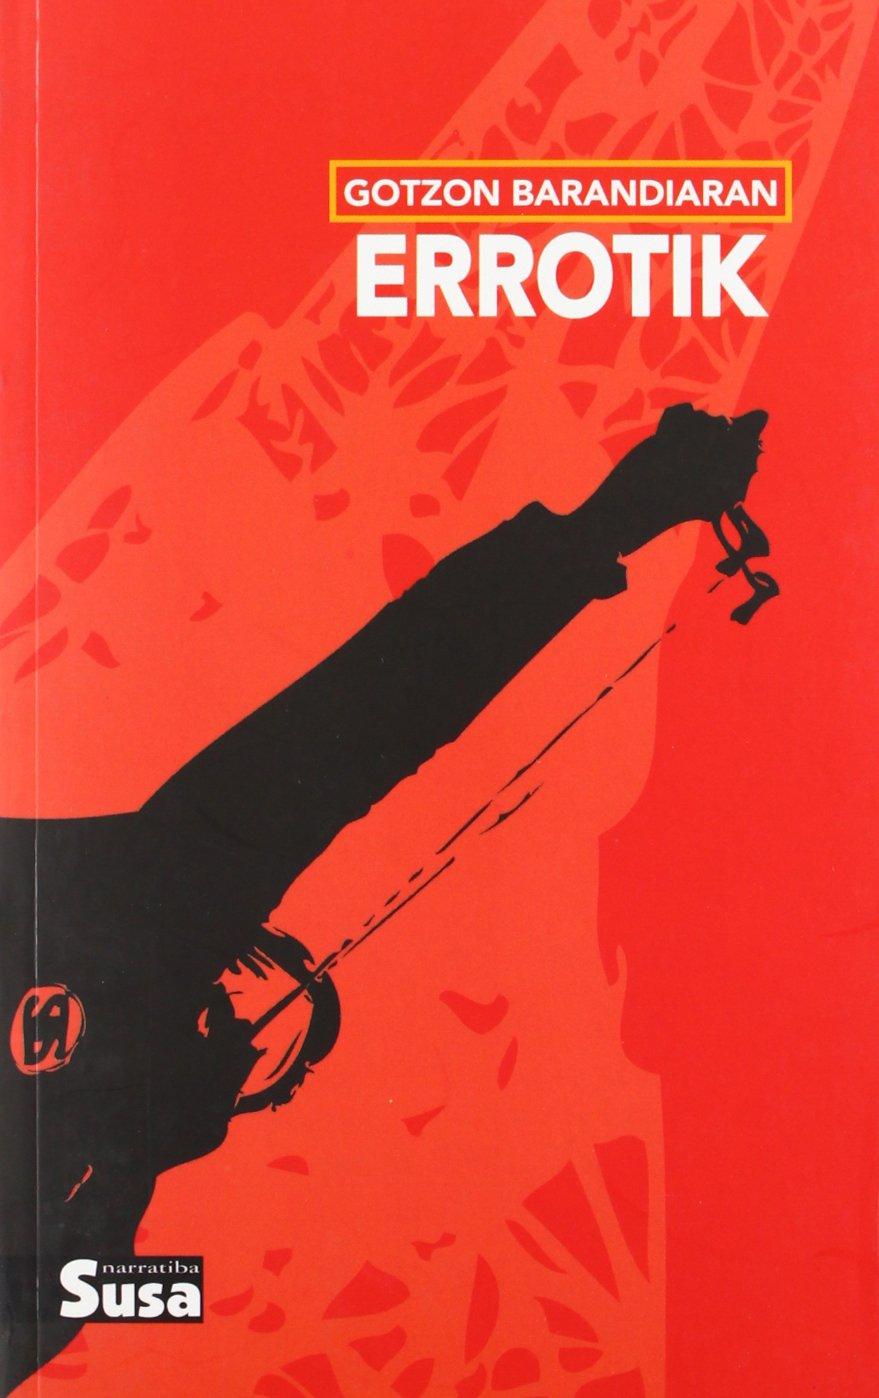 Errotik (Narratiba (susa)) (Euskera) Tapa blanda – 17 nov 2010 Gotzon Barandiaran Susa (estrata Liburuak S.L.) 8492468246 Tourisme étranger